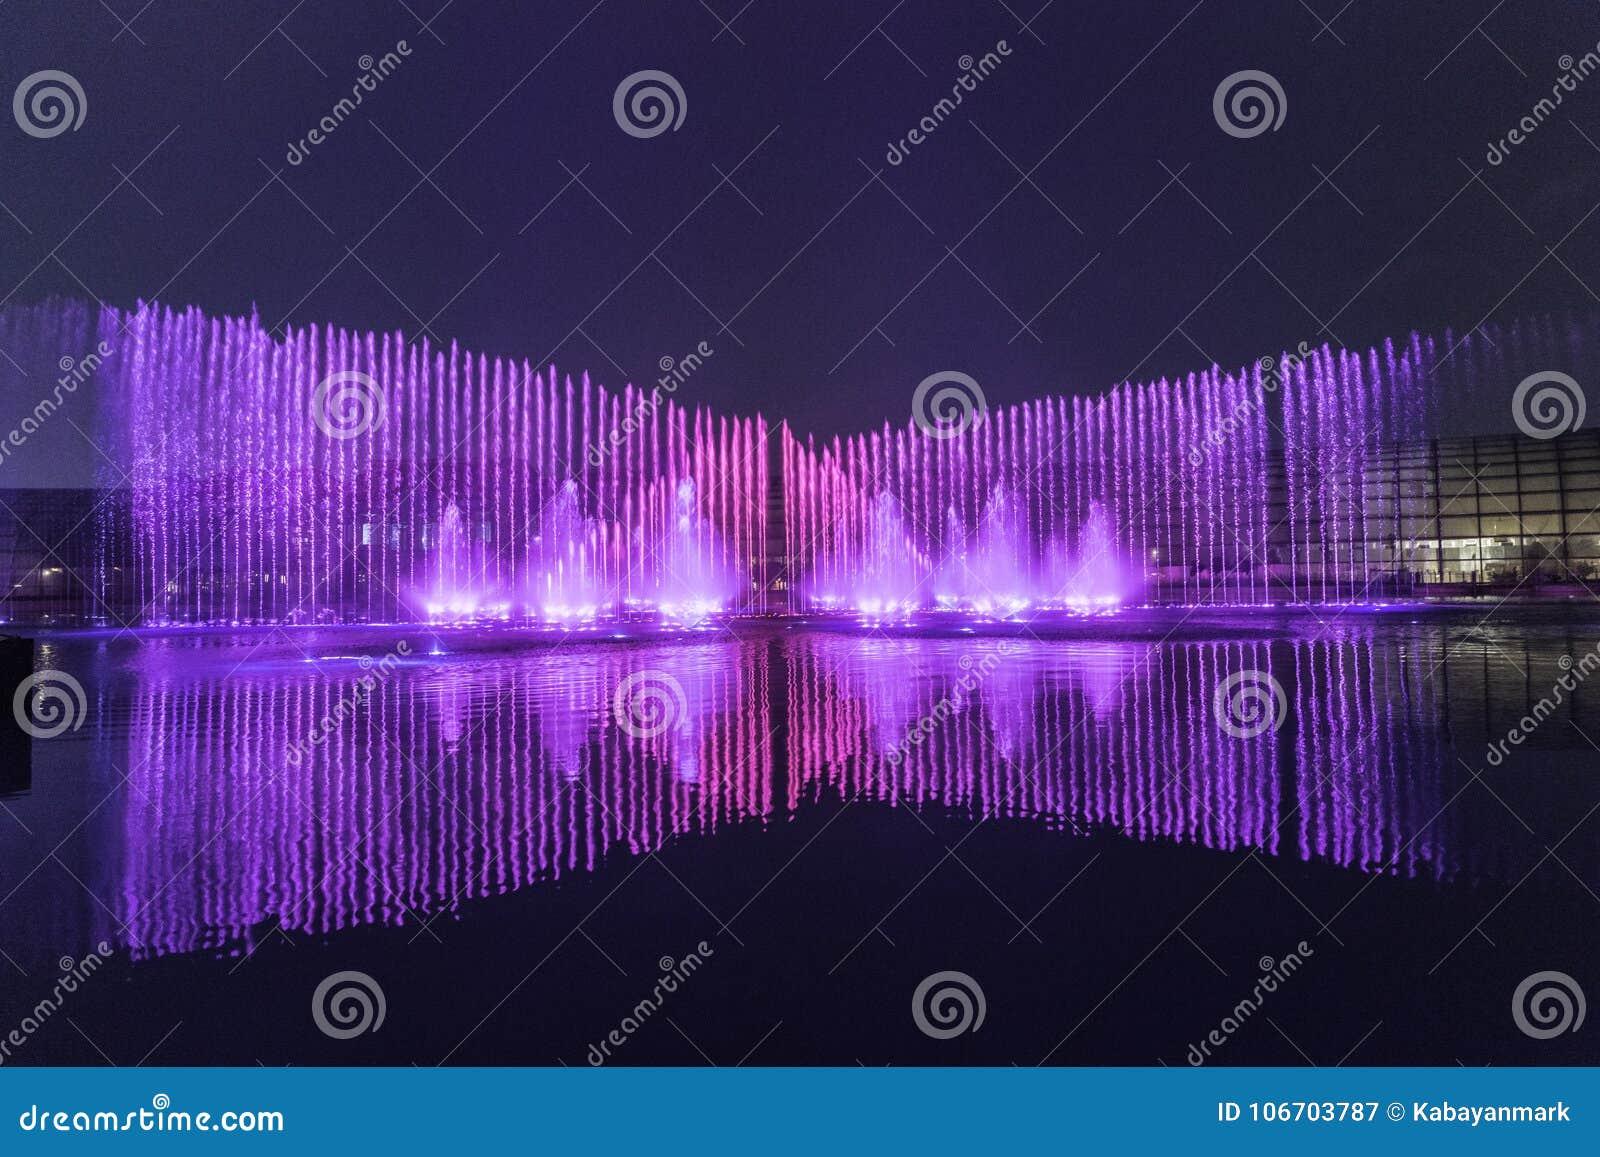 Electric fountain musical, okada, manila, night, illuminated